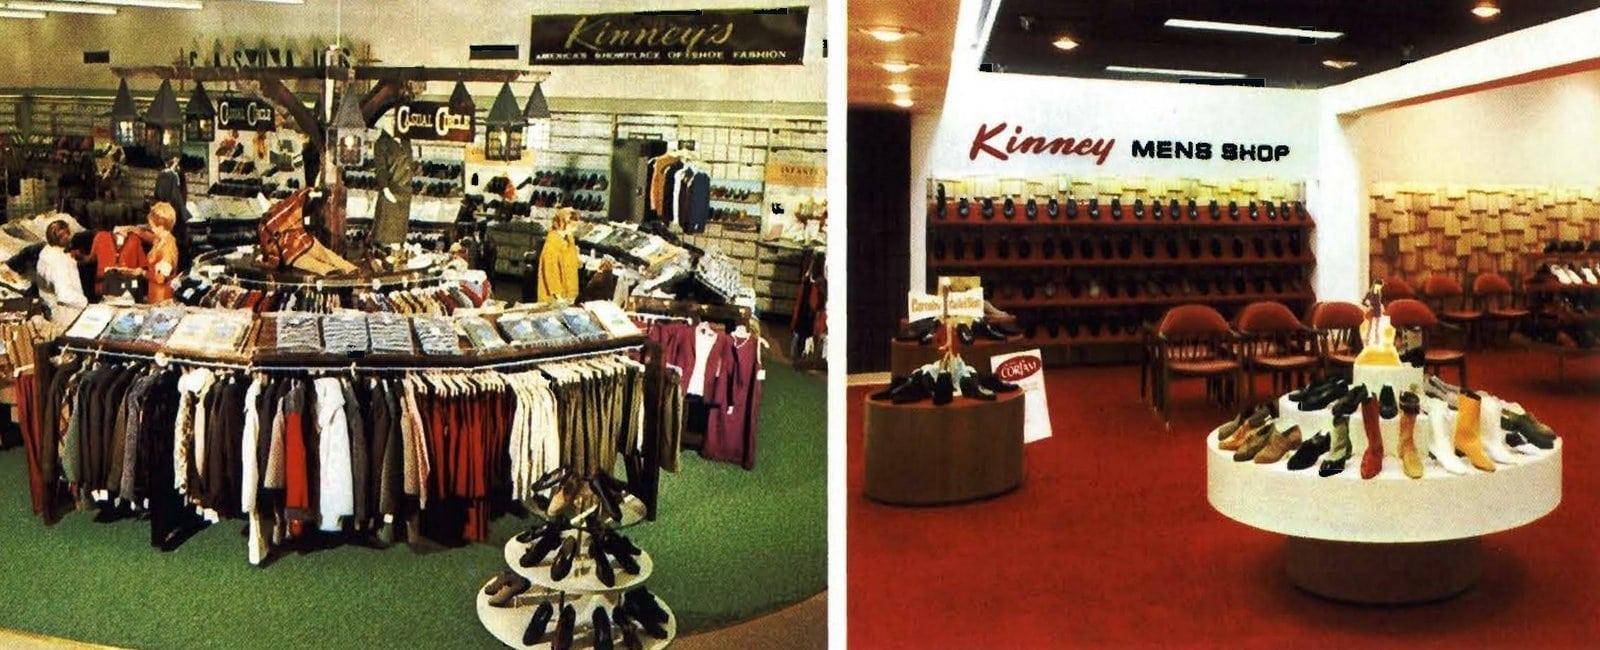 Retro sixties Kinney shoe stores (1966)